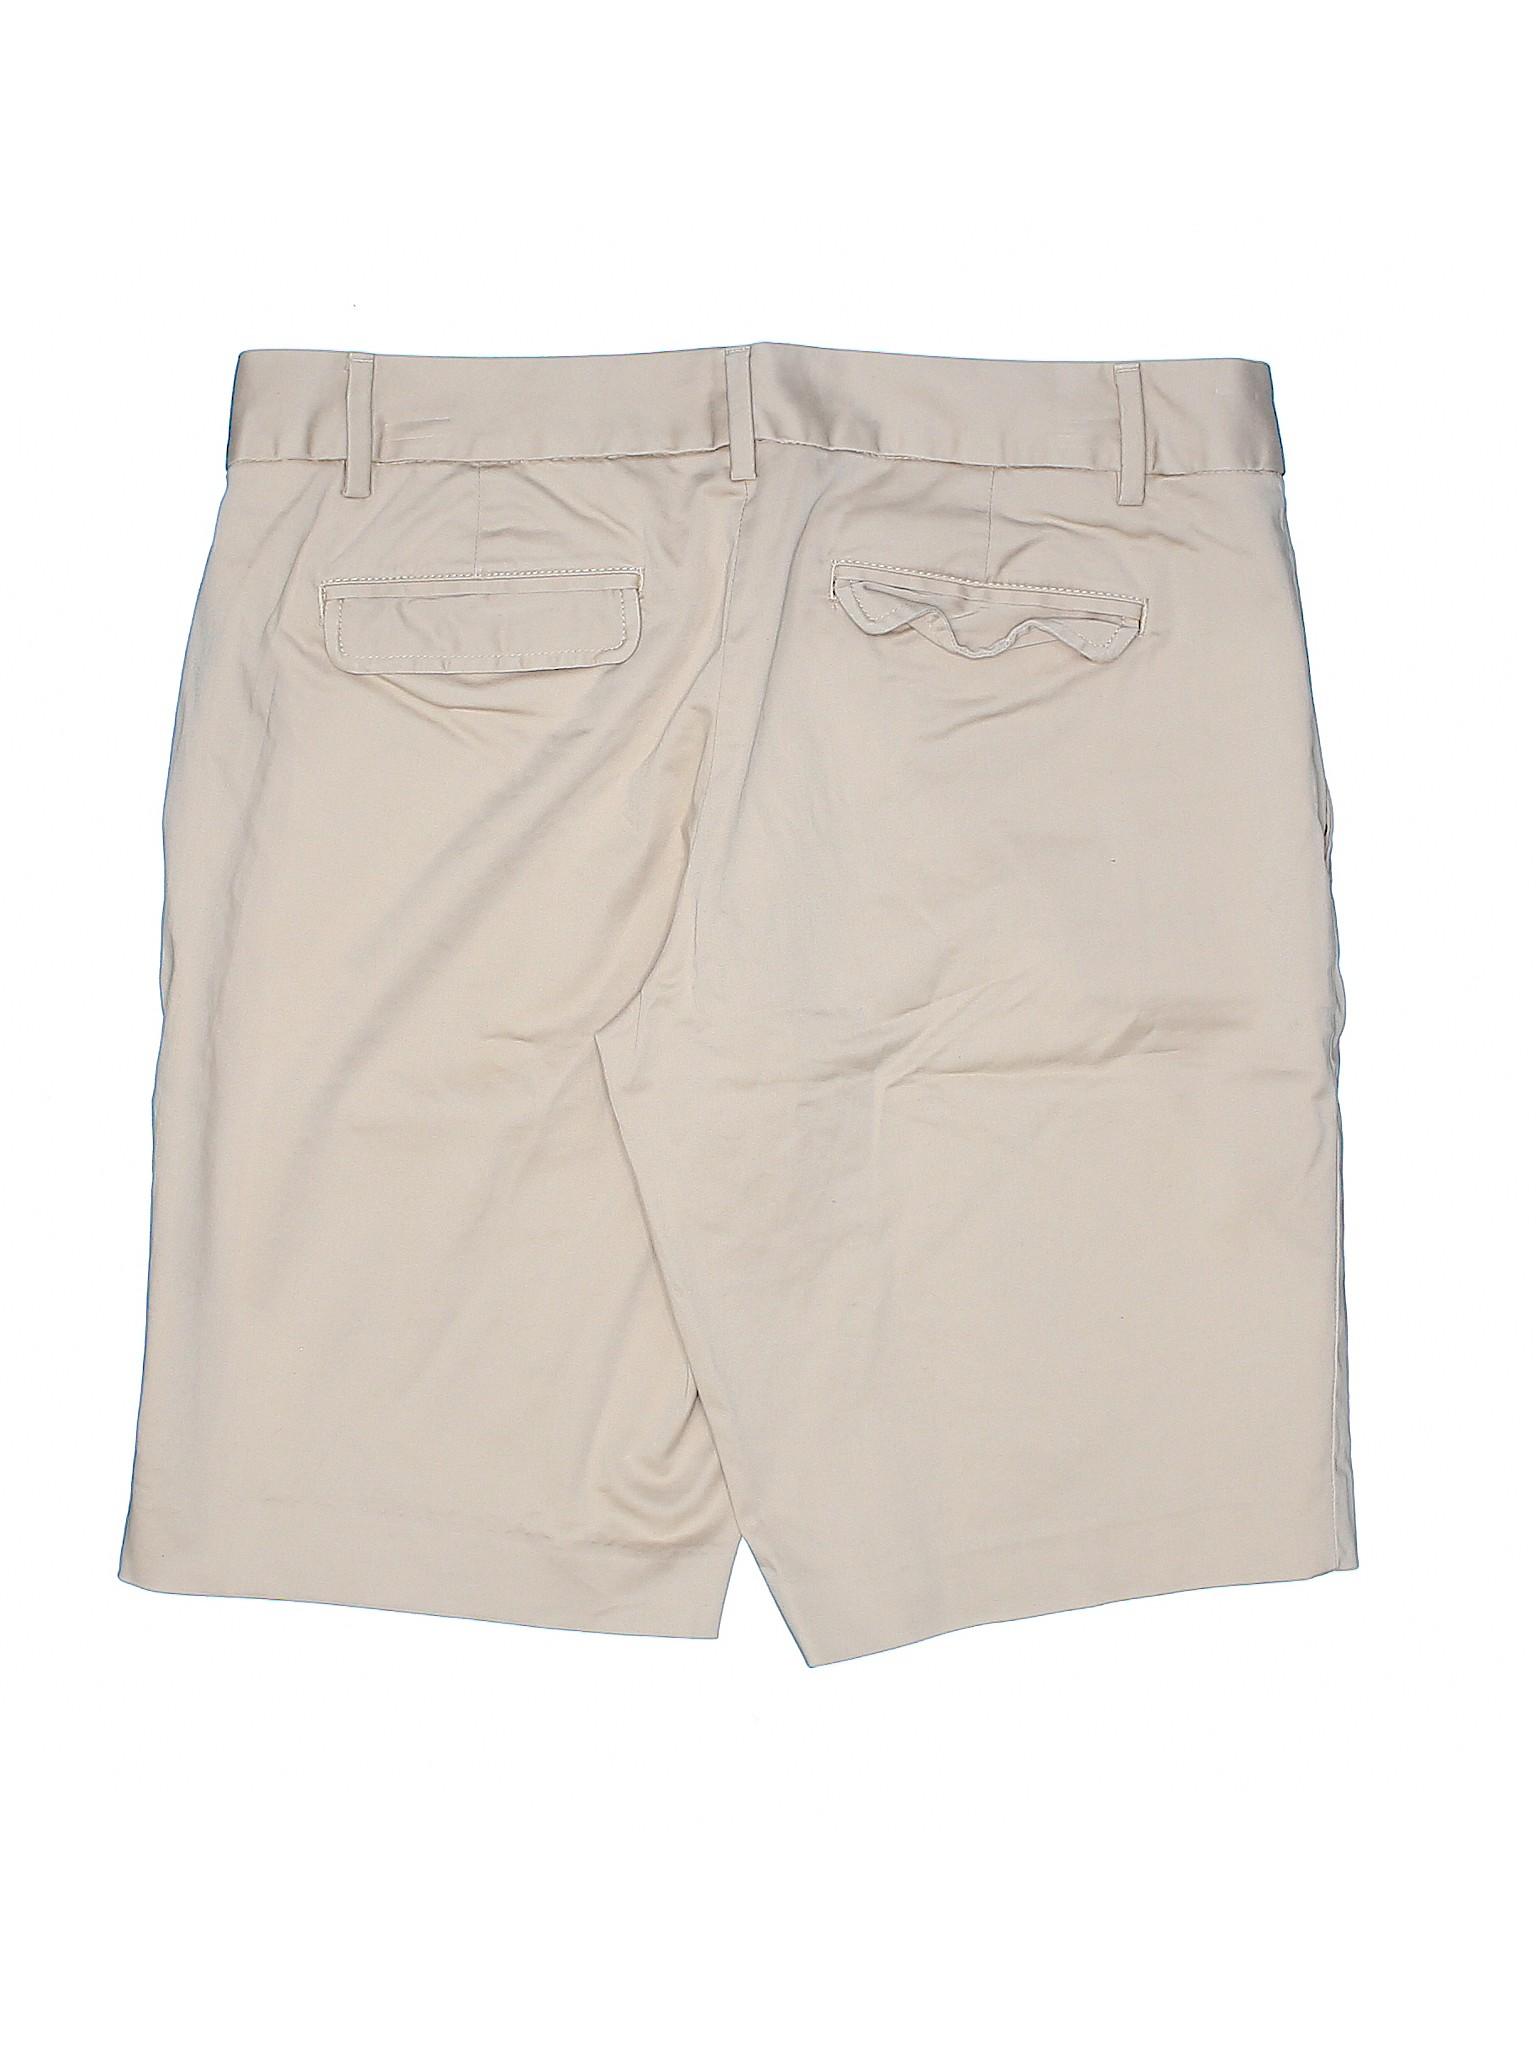 Boutique Boutique Republic leisure Shorts leisure Banana 7w7xHrq8